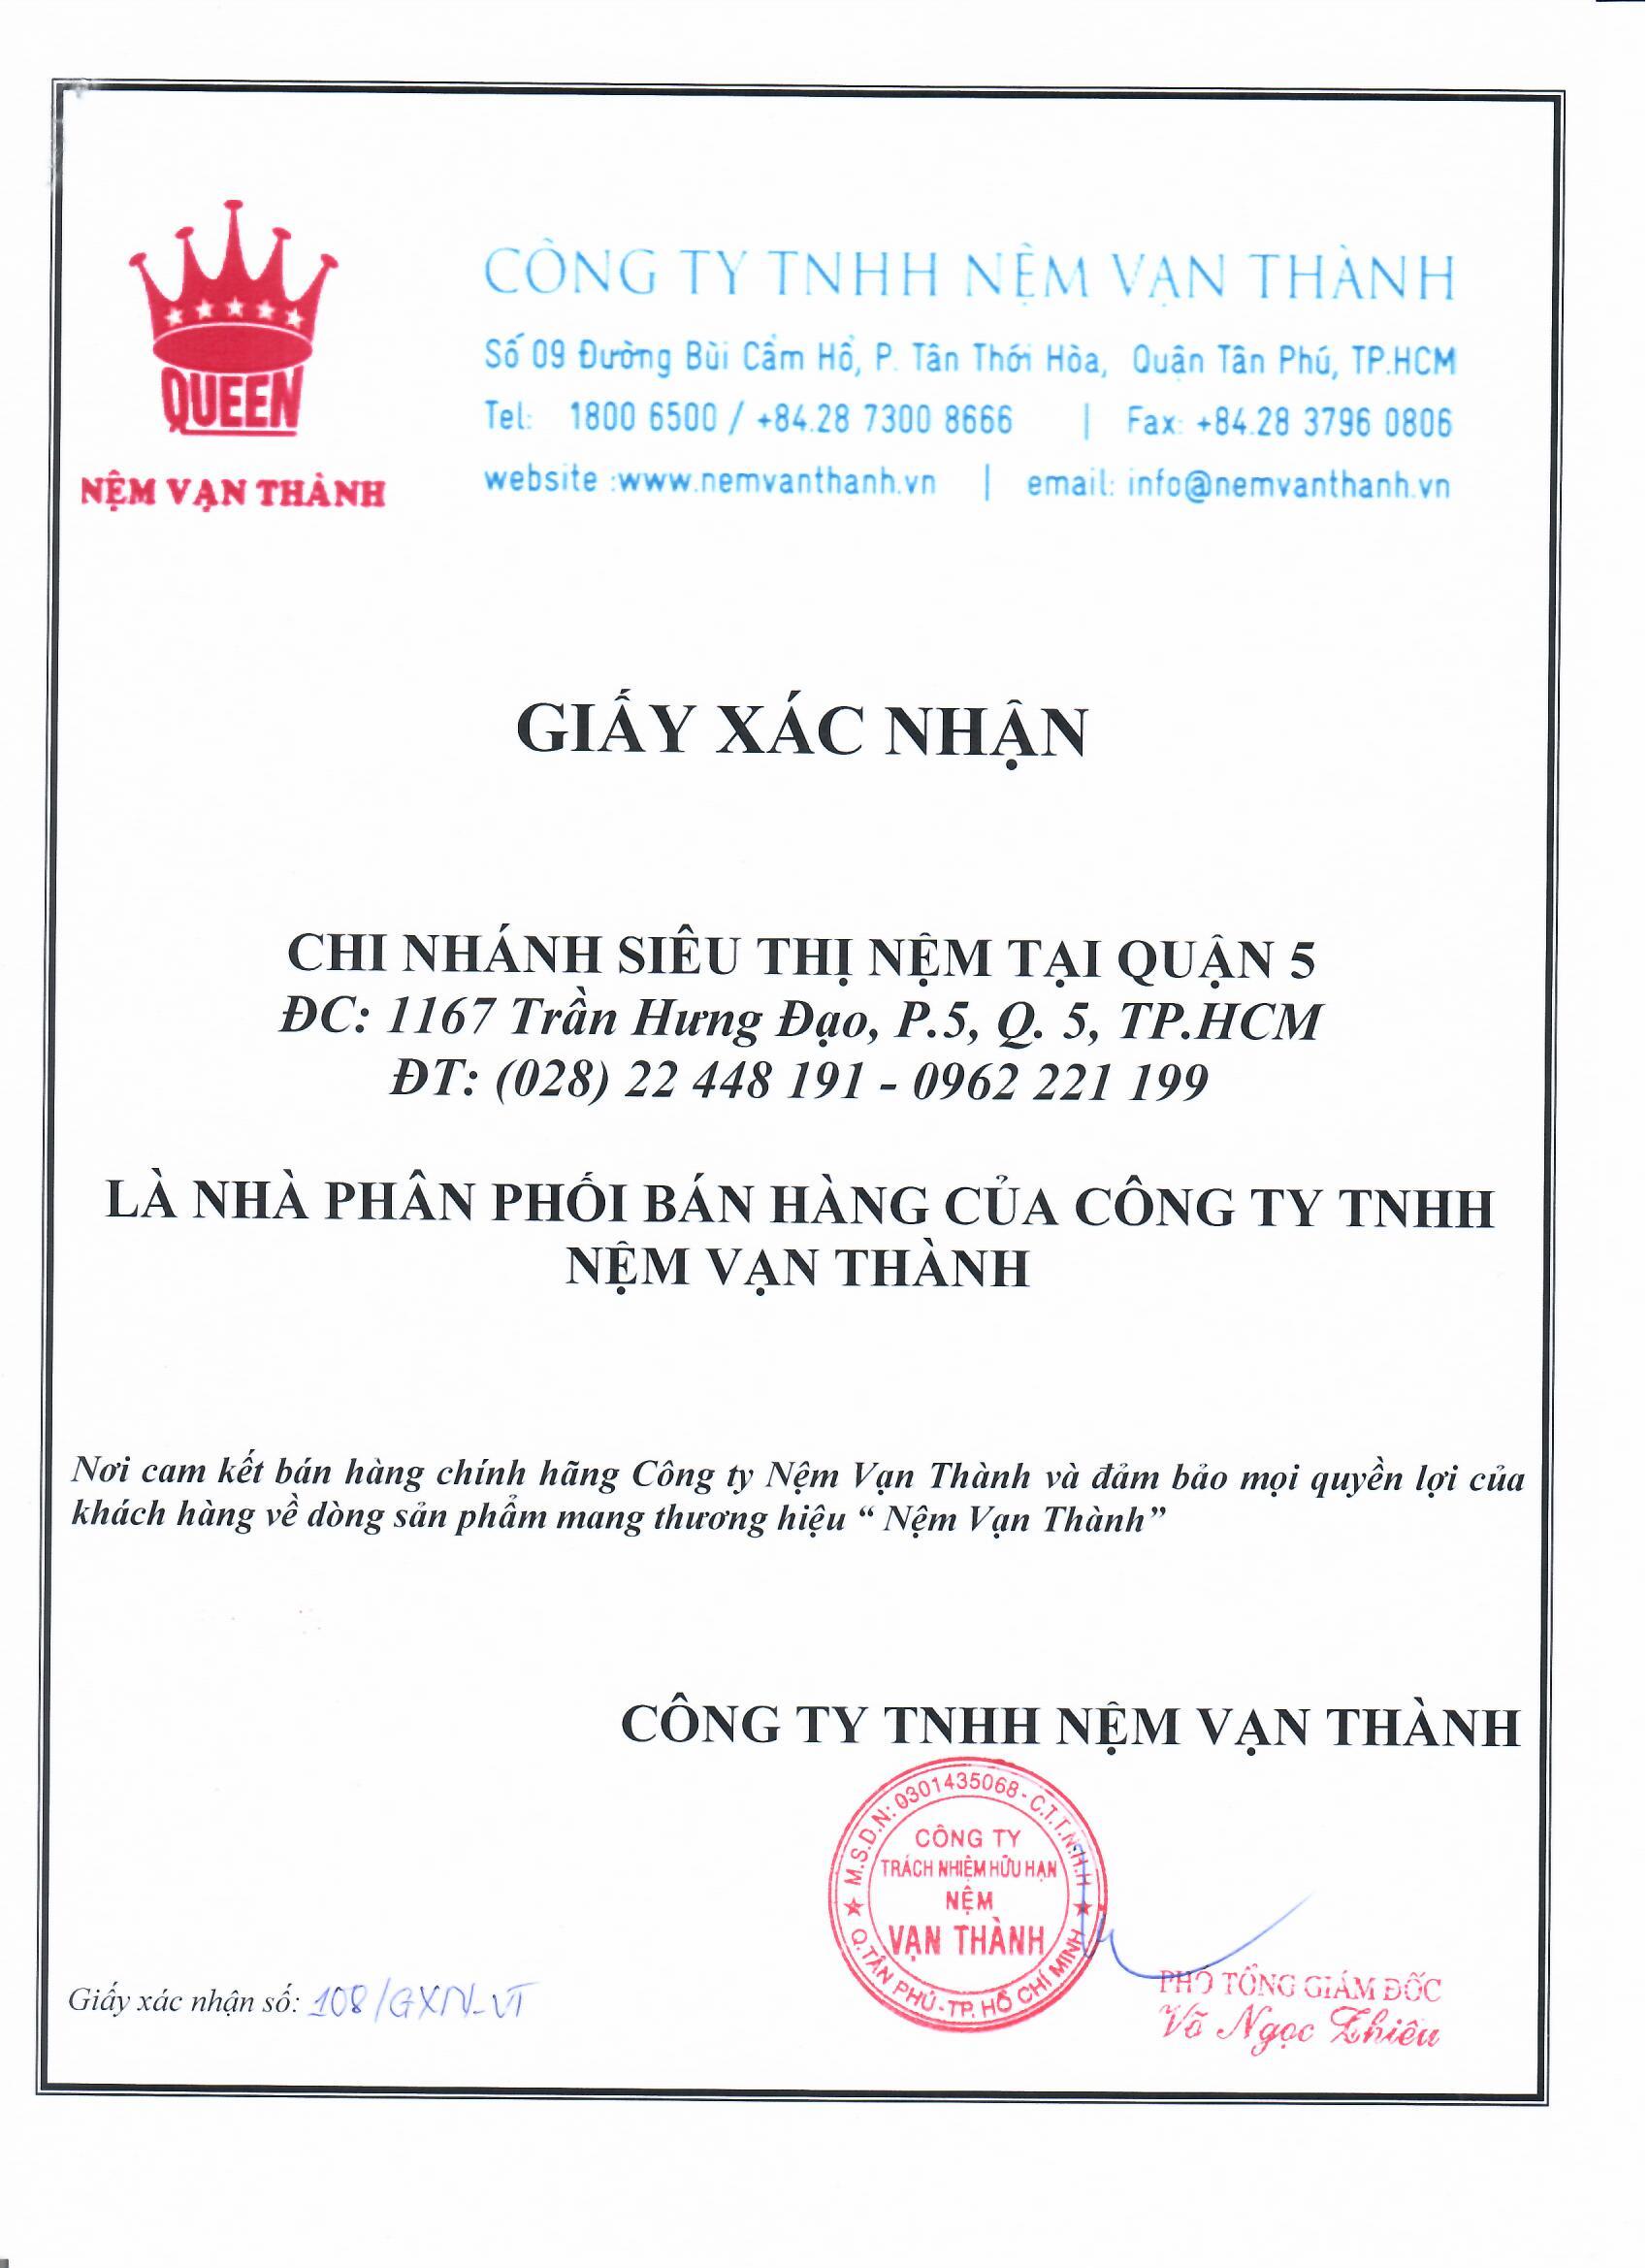 Giay_Xac_Nhan_Phan_Phoi_Van_Thanh_1167THD